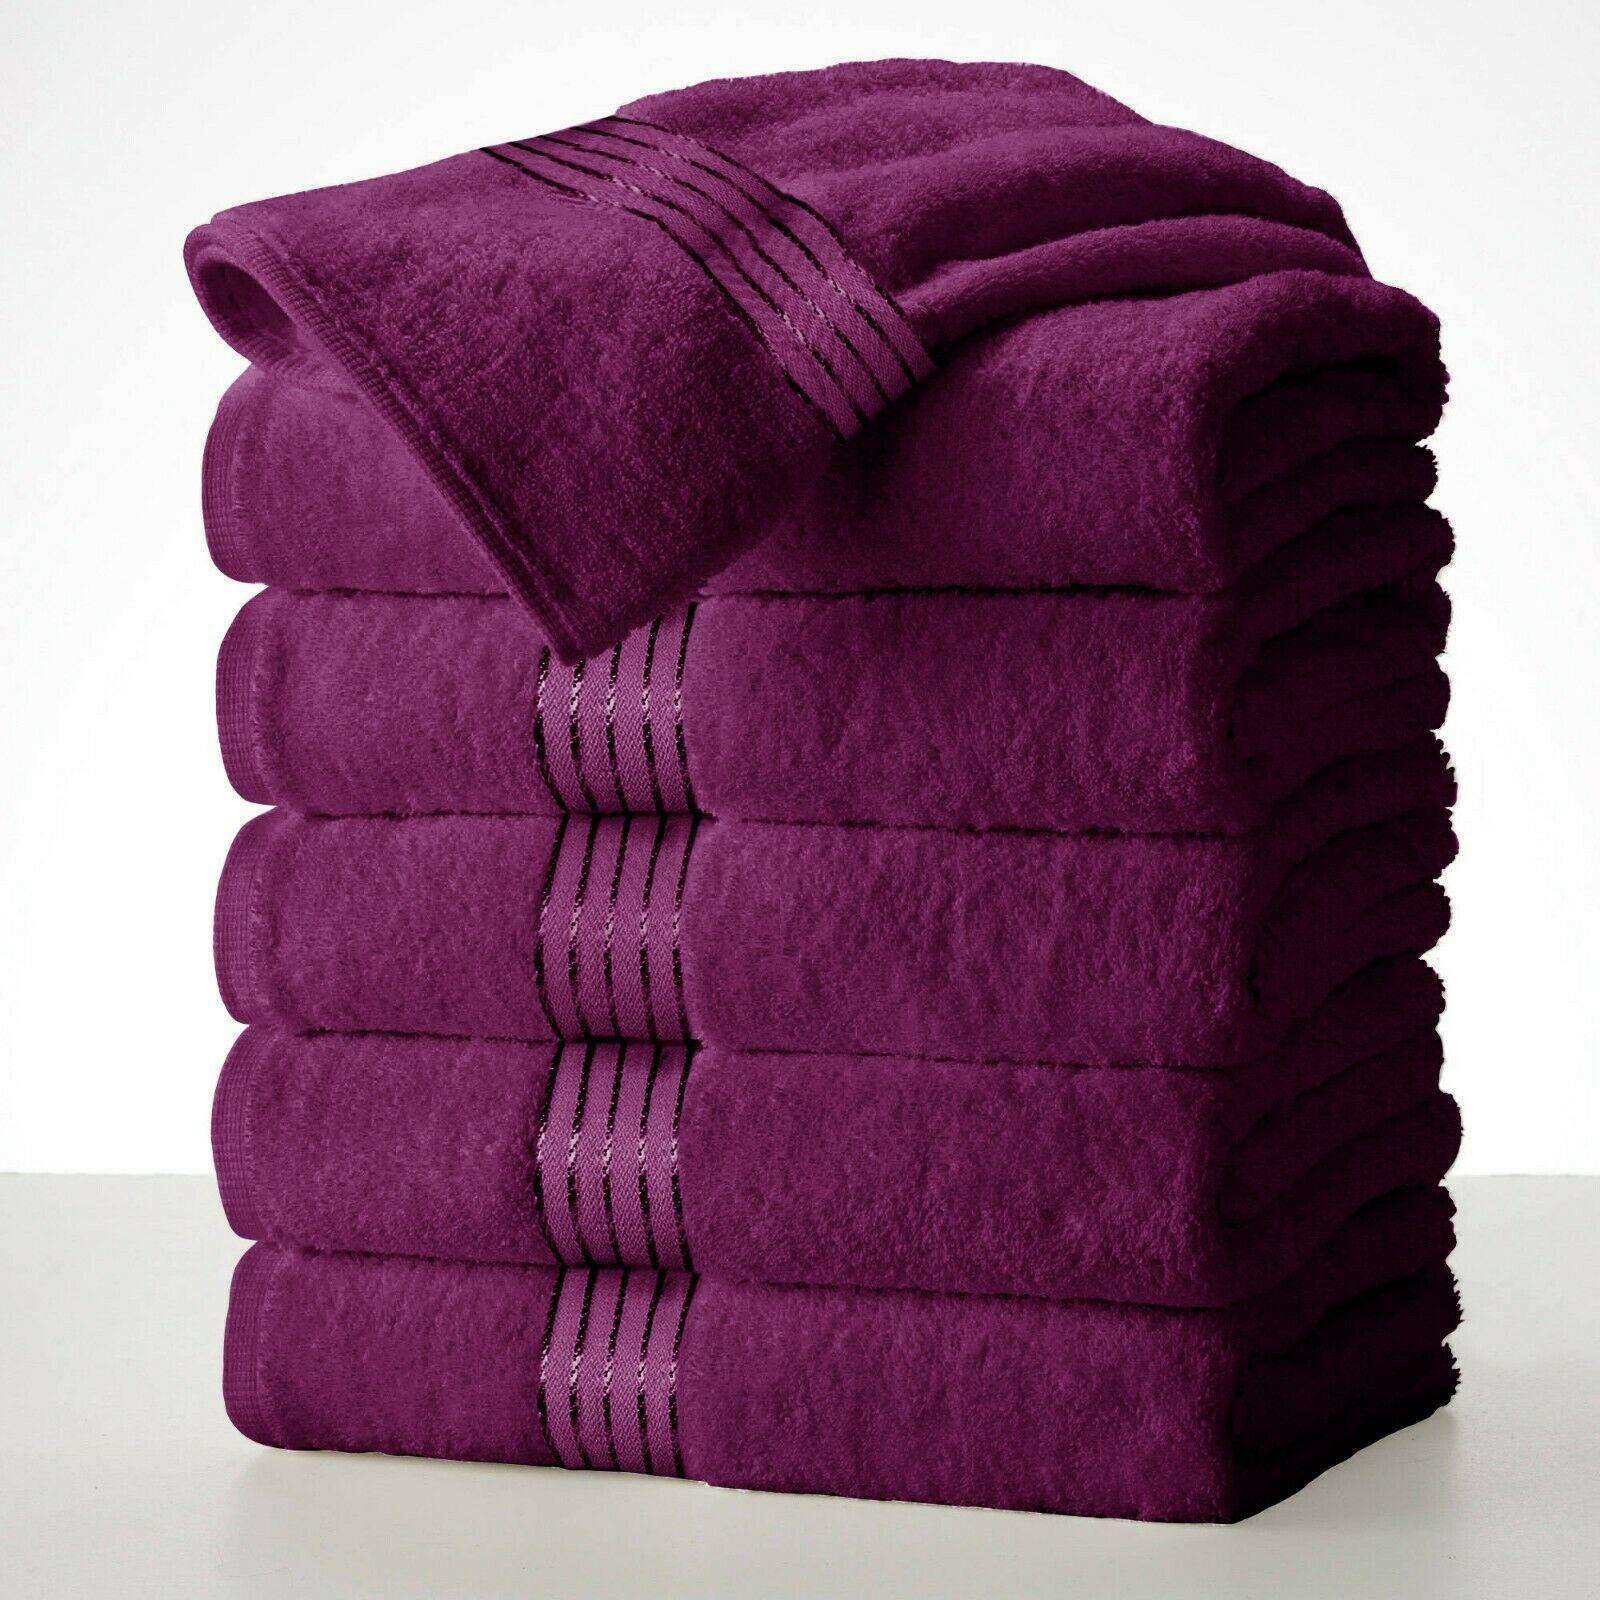 Luxury Silver Gray Bath Towels Packs Sets 100 Cotton 27 X55 500 Gsm Soft Grey Best Bath Towels Purple Towels Bath Towels